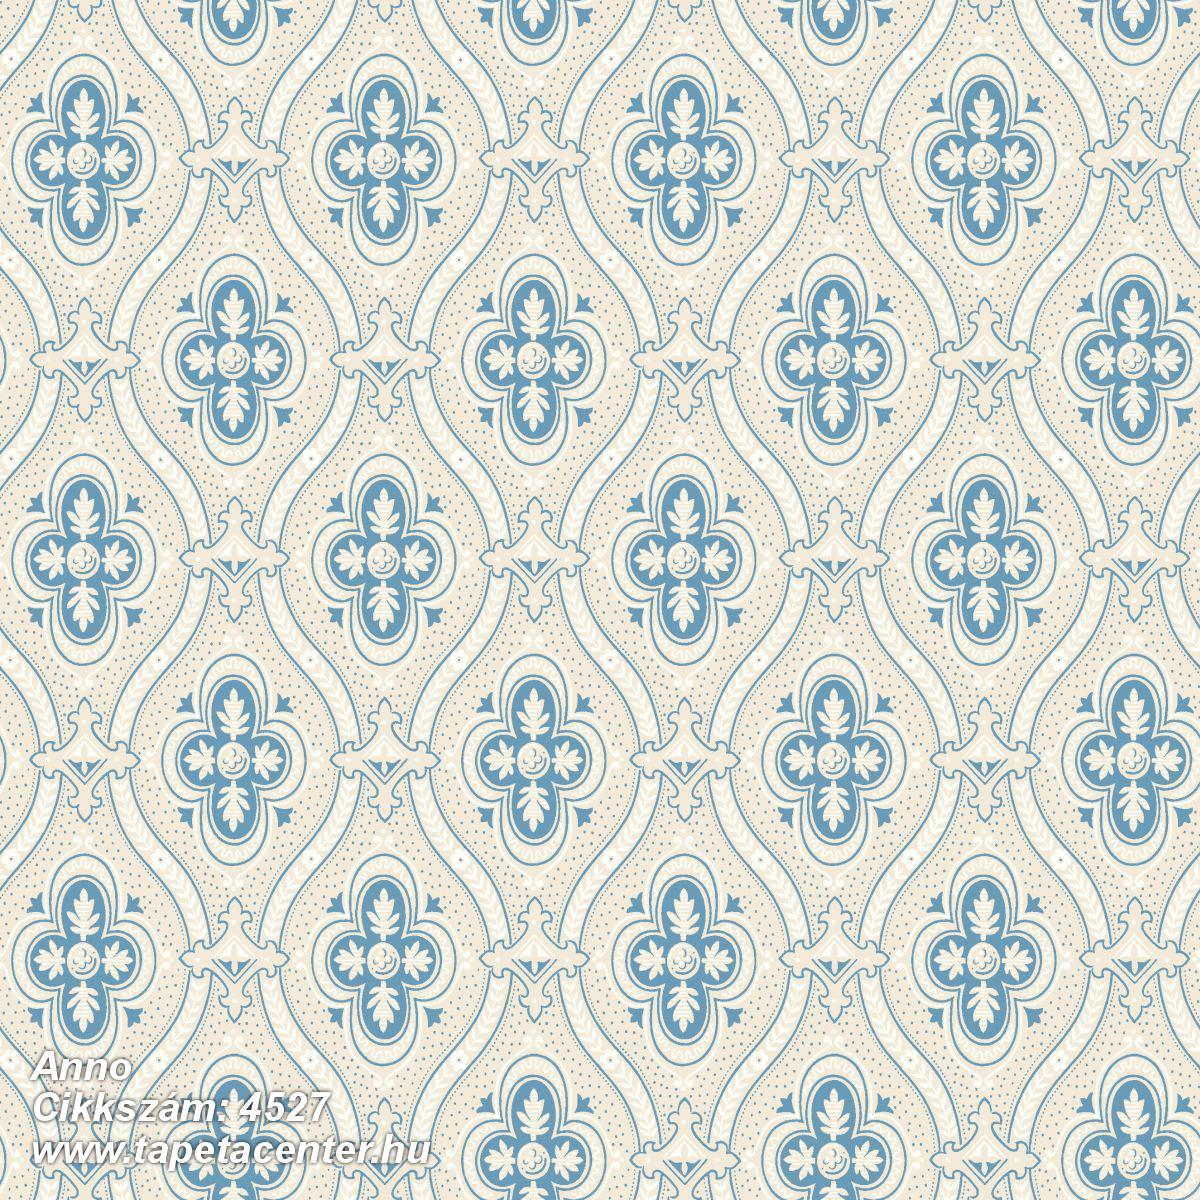 Barokk-klasszikus,bézs-drapp,bronz,kék,vajszín,lemosható,vlies tapéta